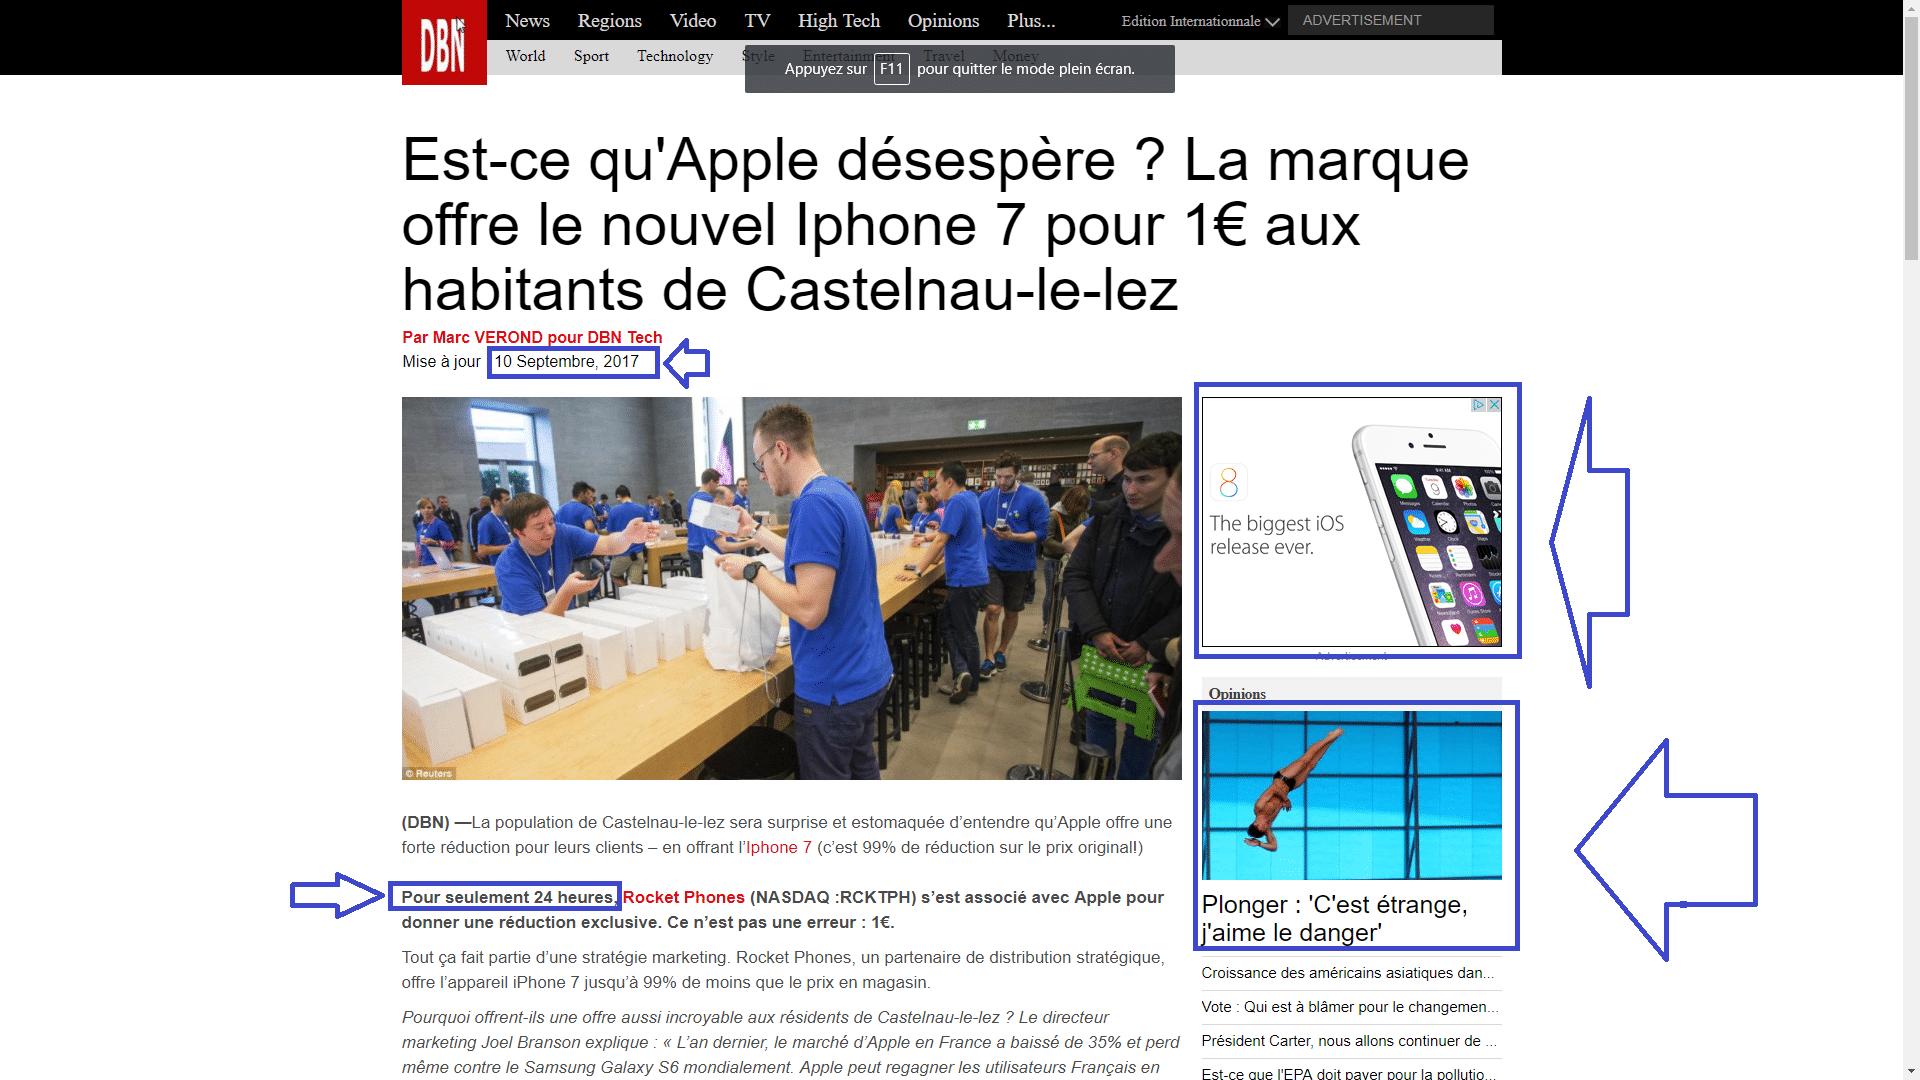 arnaque concernant iPhone 7 à 1€